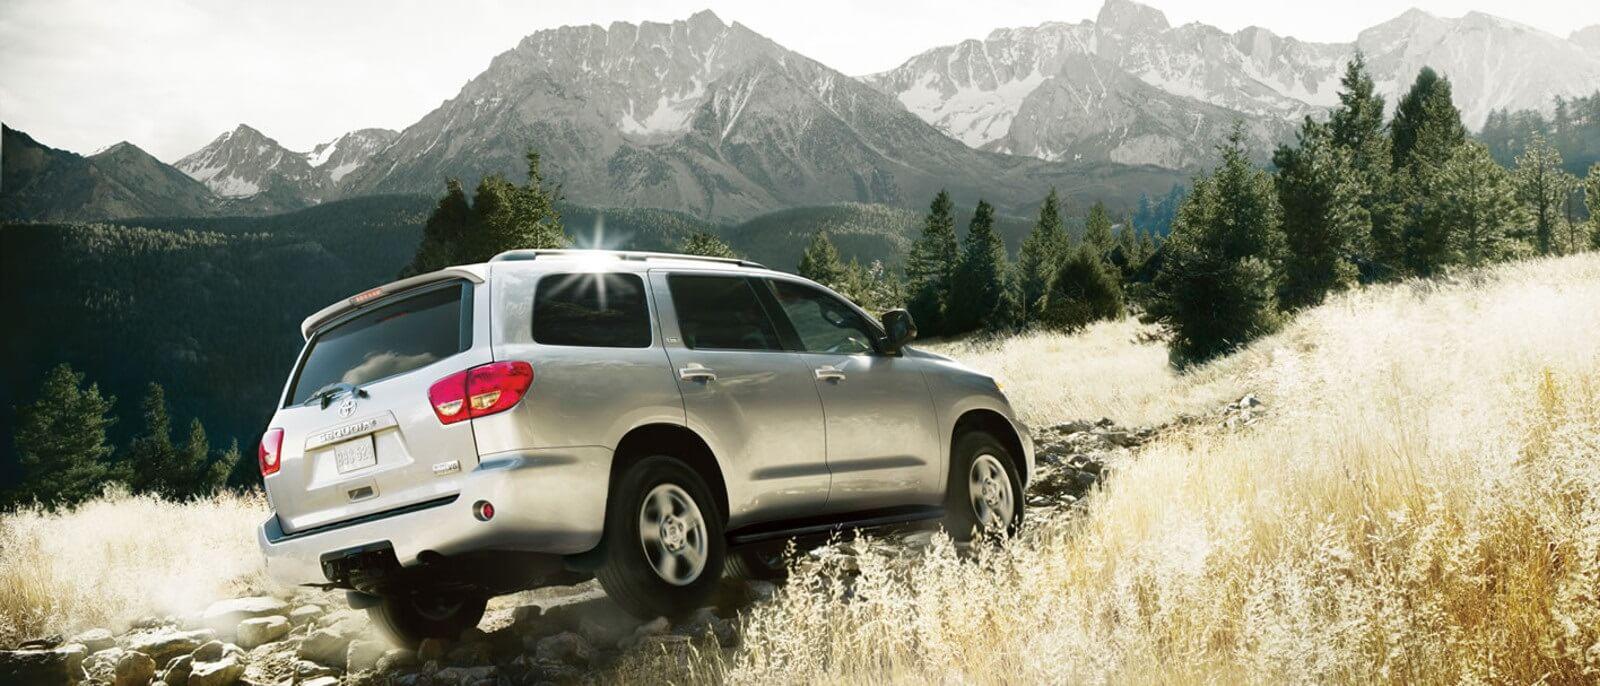 2016-Toyota-Sequoia Rear